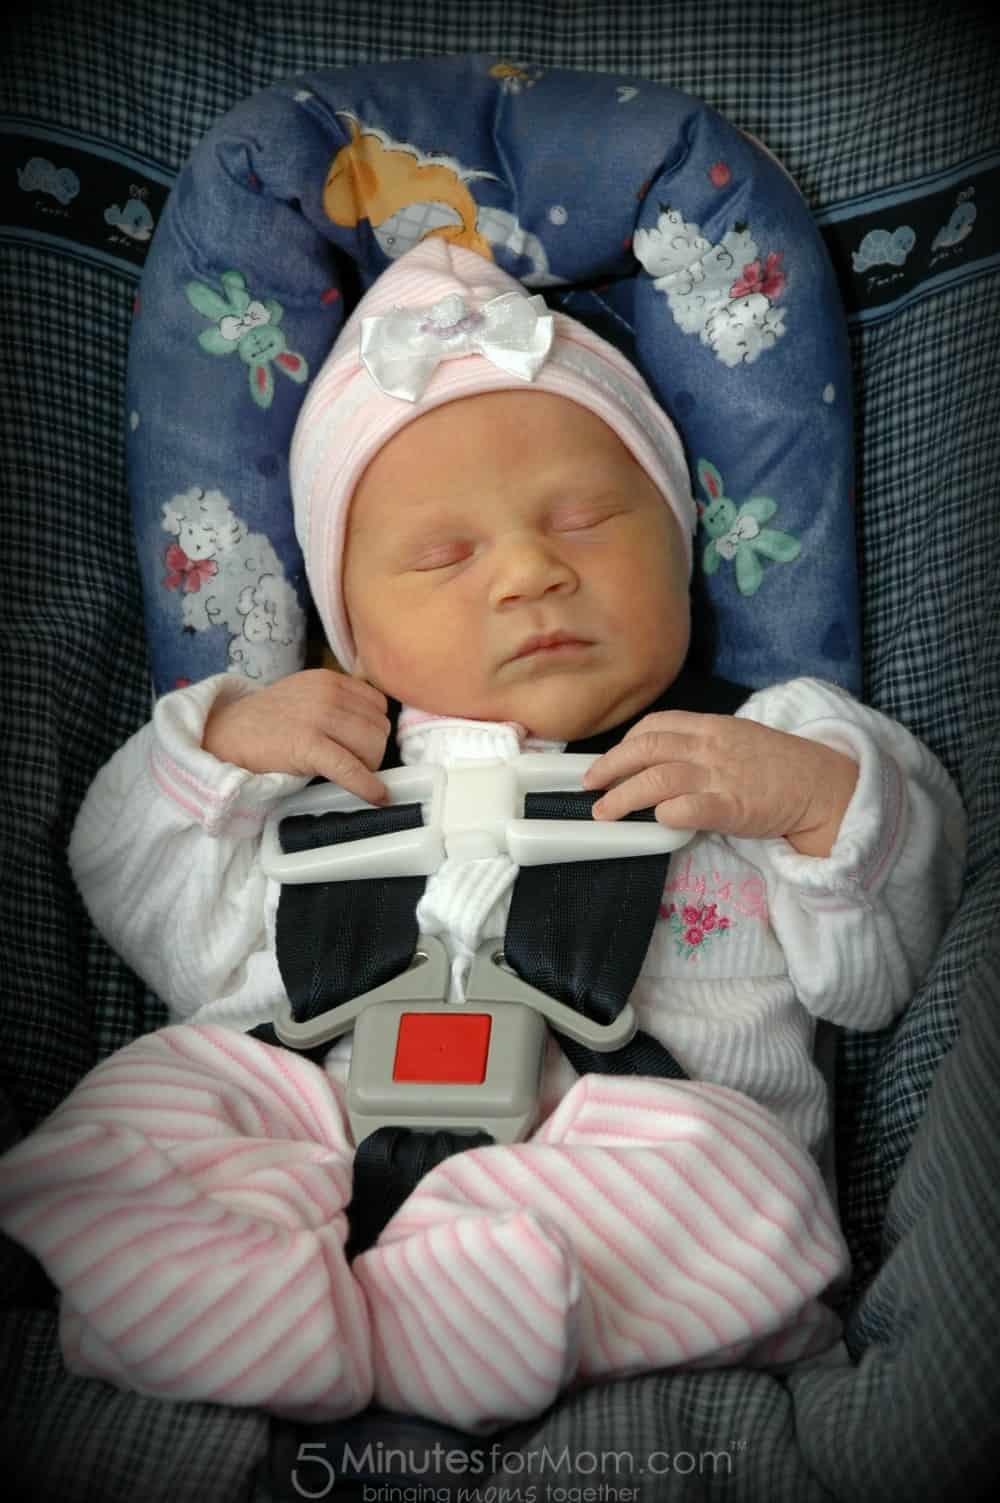 First car ride home